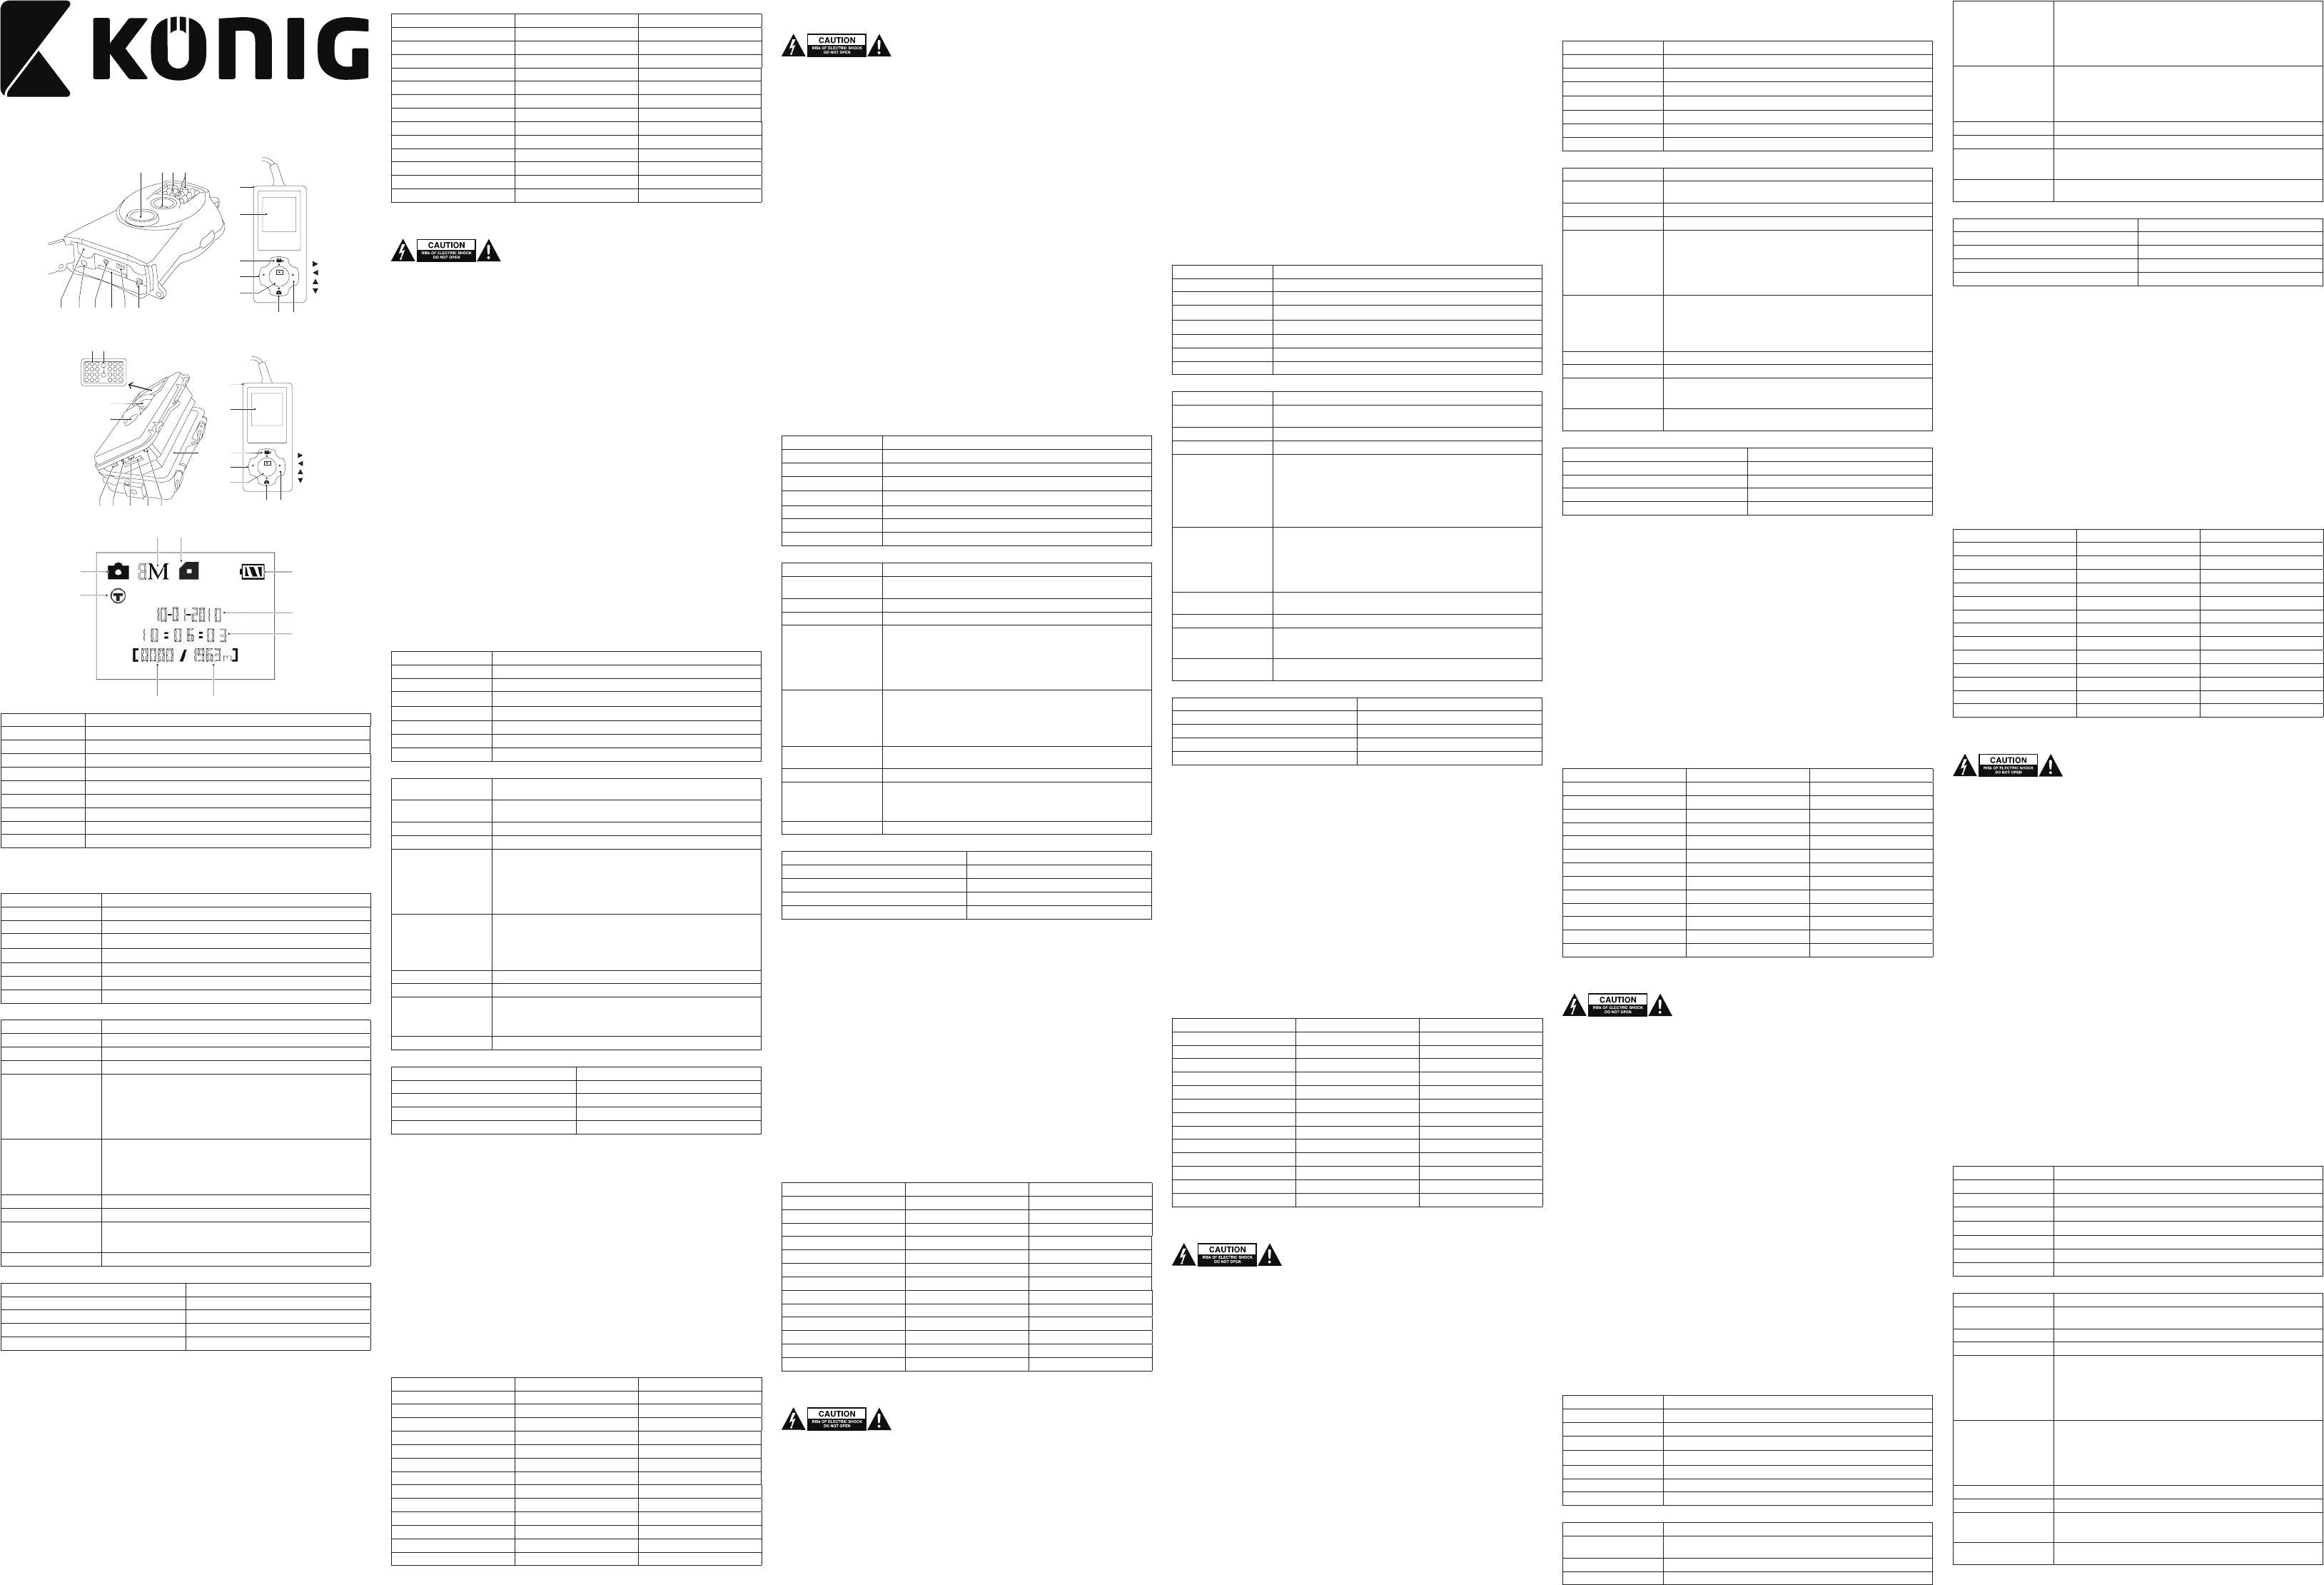 Table Exterieur Design Élégant Handleiding Konig Electronic Sas Dvrodr11 Pagina 2 Van 4